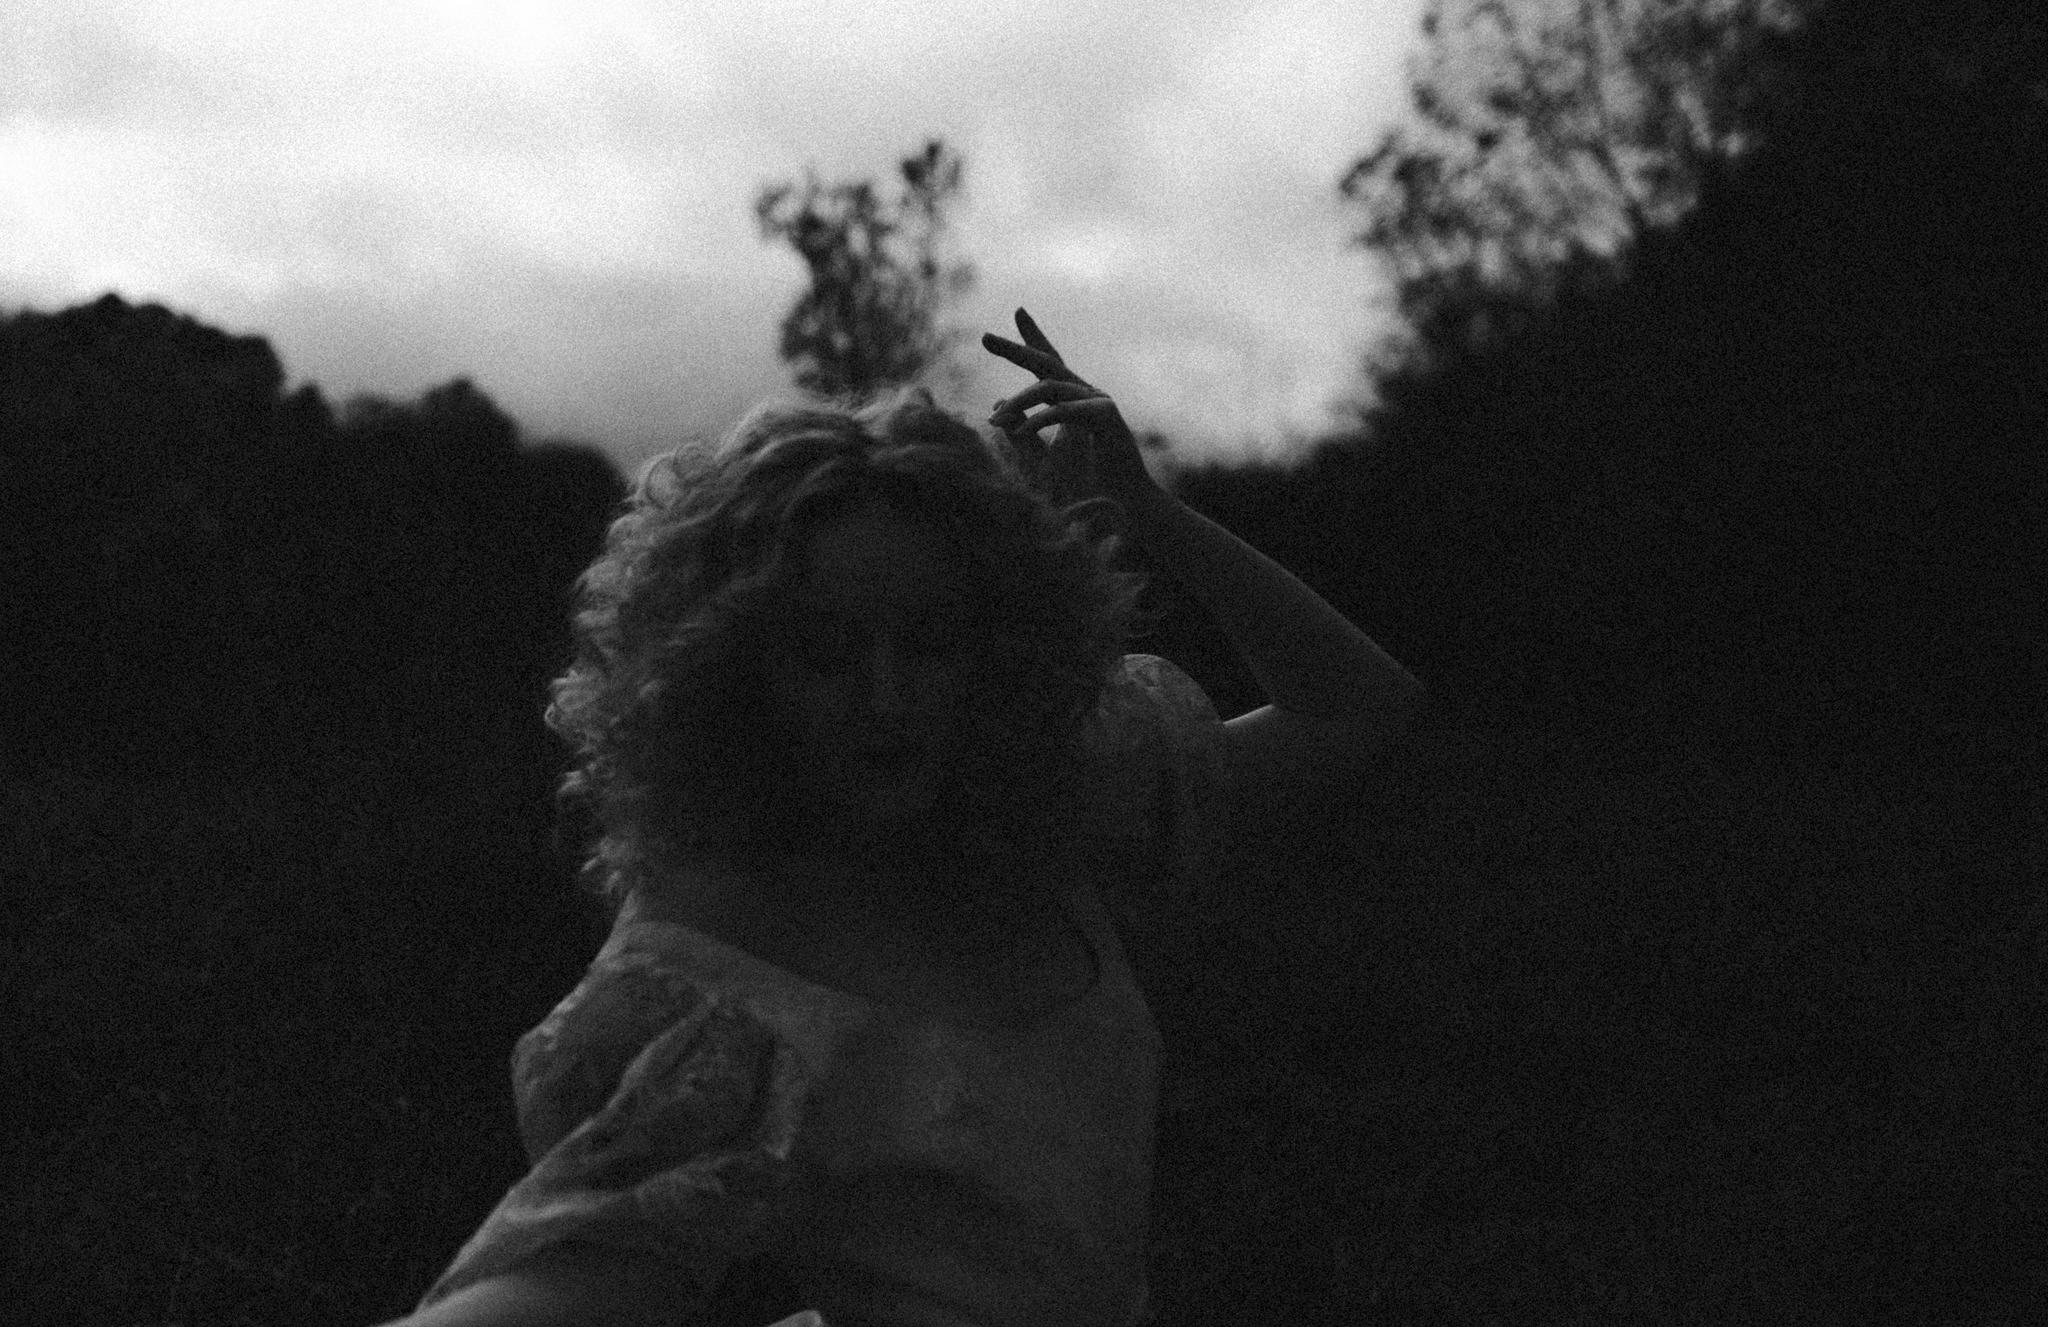 pale-witch-055fb.jpg